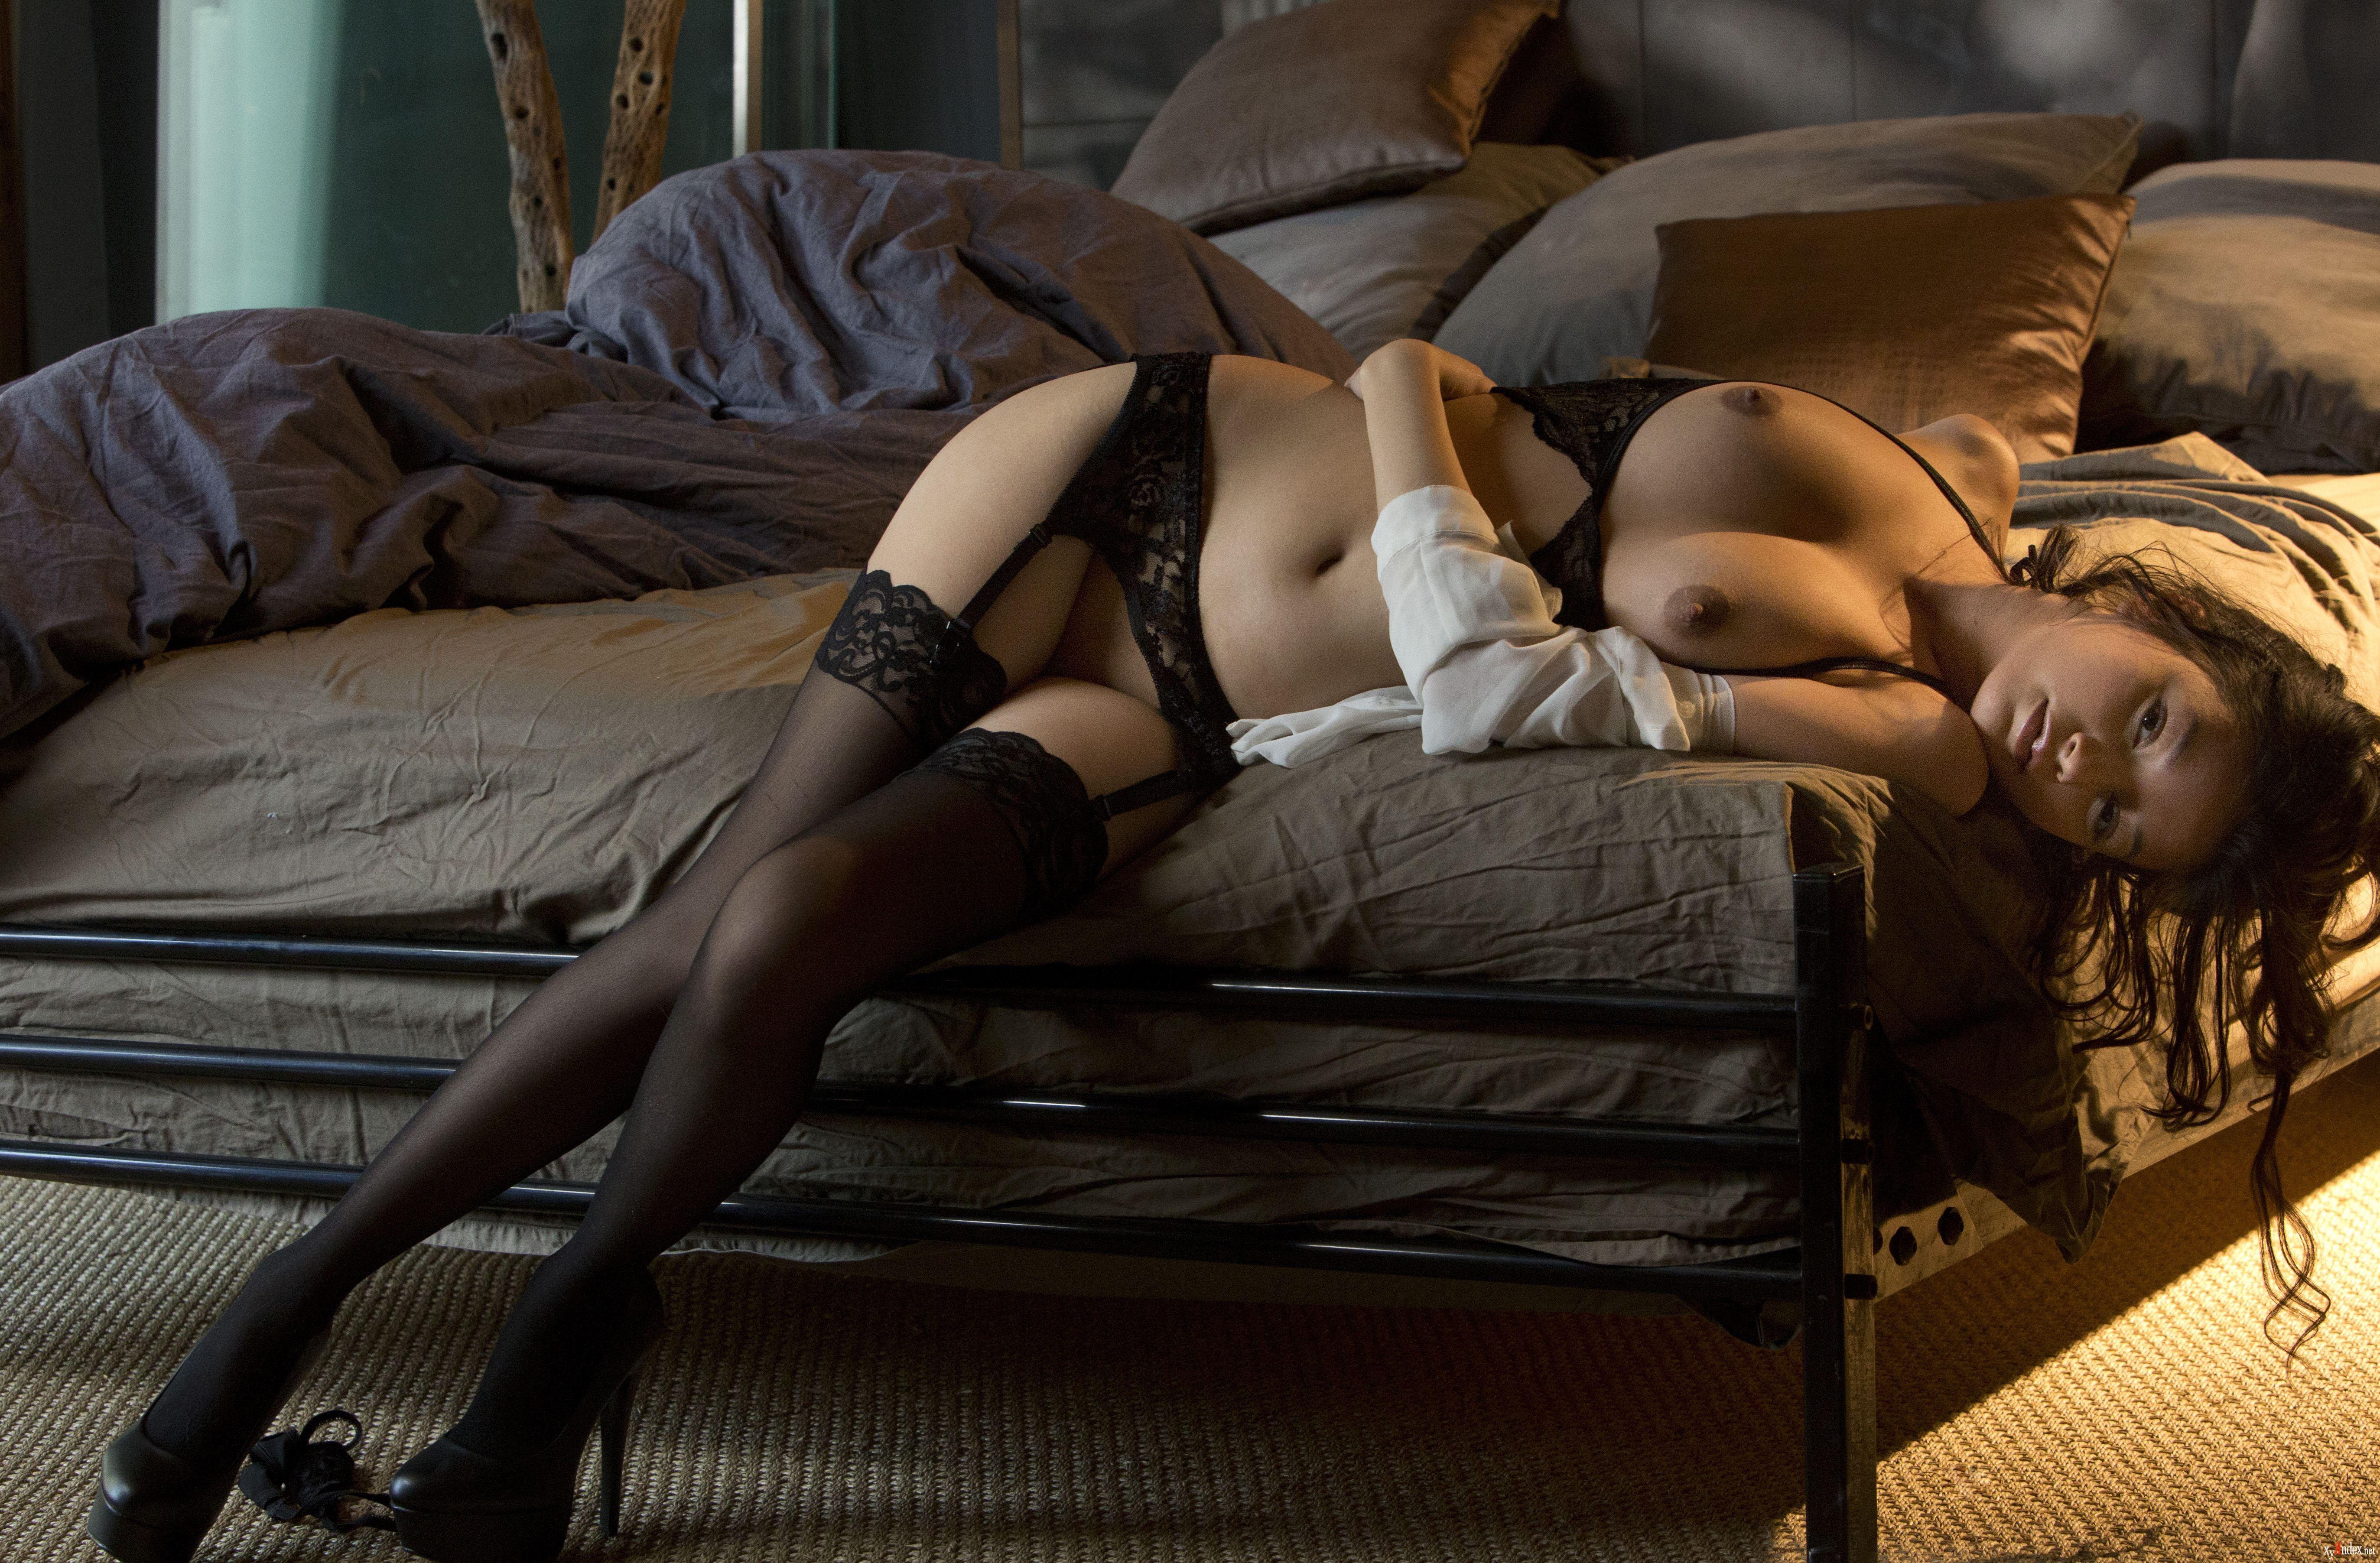 Девушки эротично одевают чулки видео — img 13